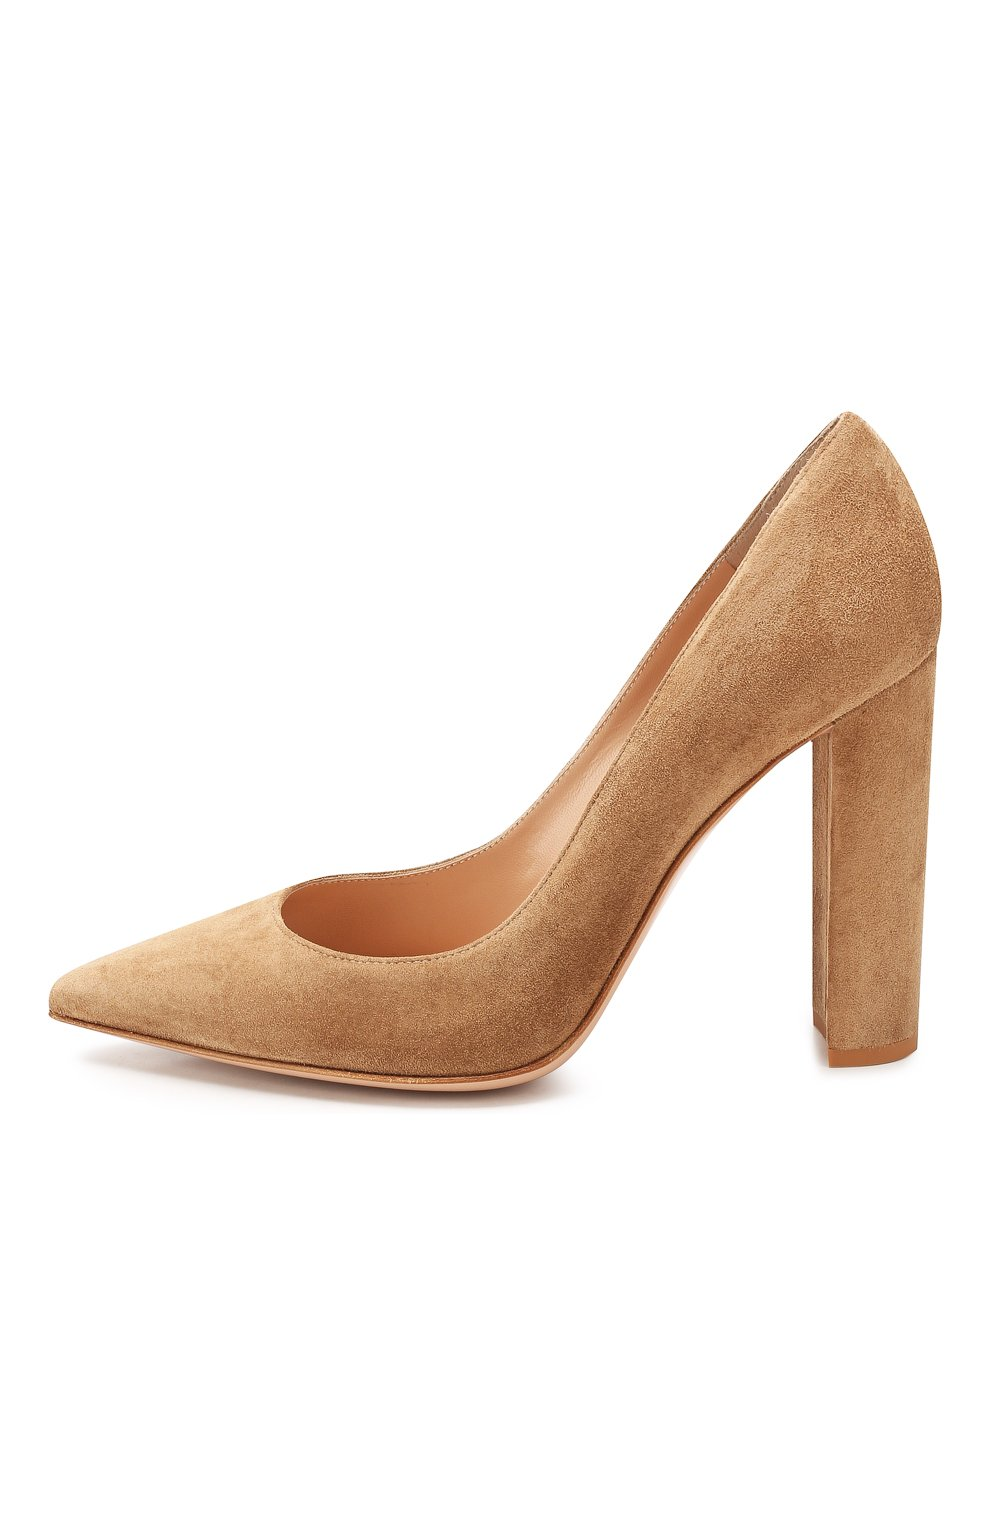 Замшевые туфли Piper  | Фото №3